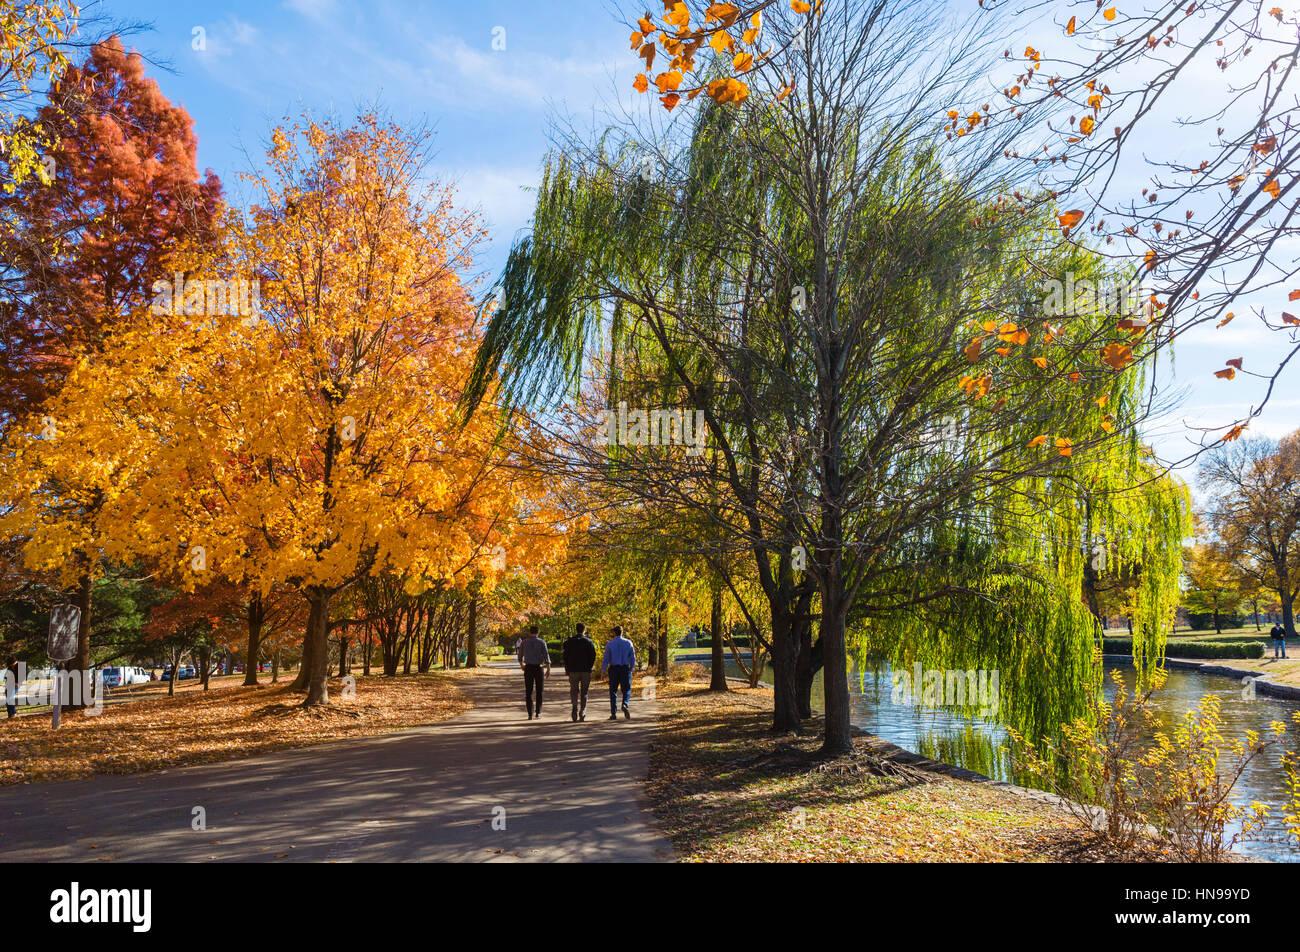 Centennial Park, Nashville,Tennessee, USA - Stock Image